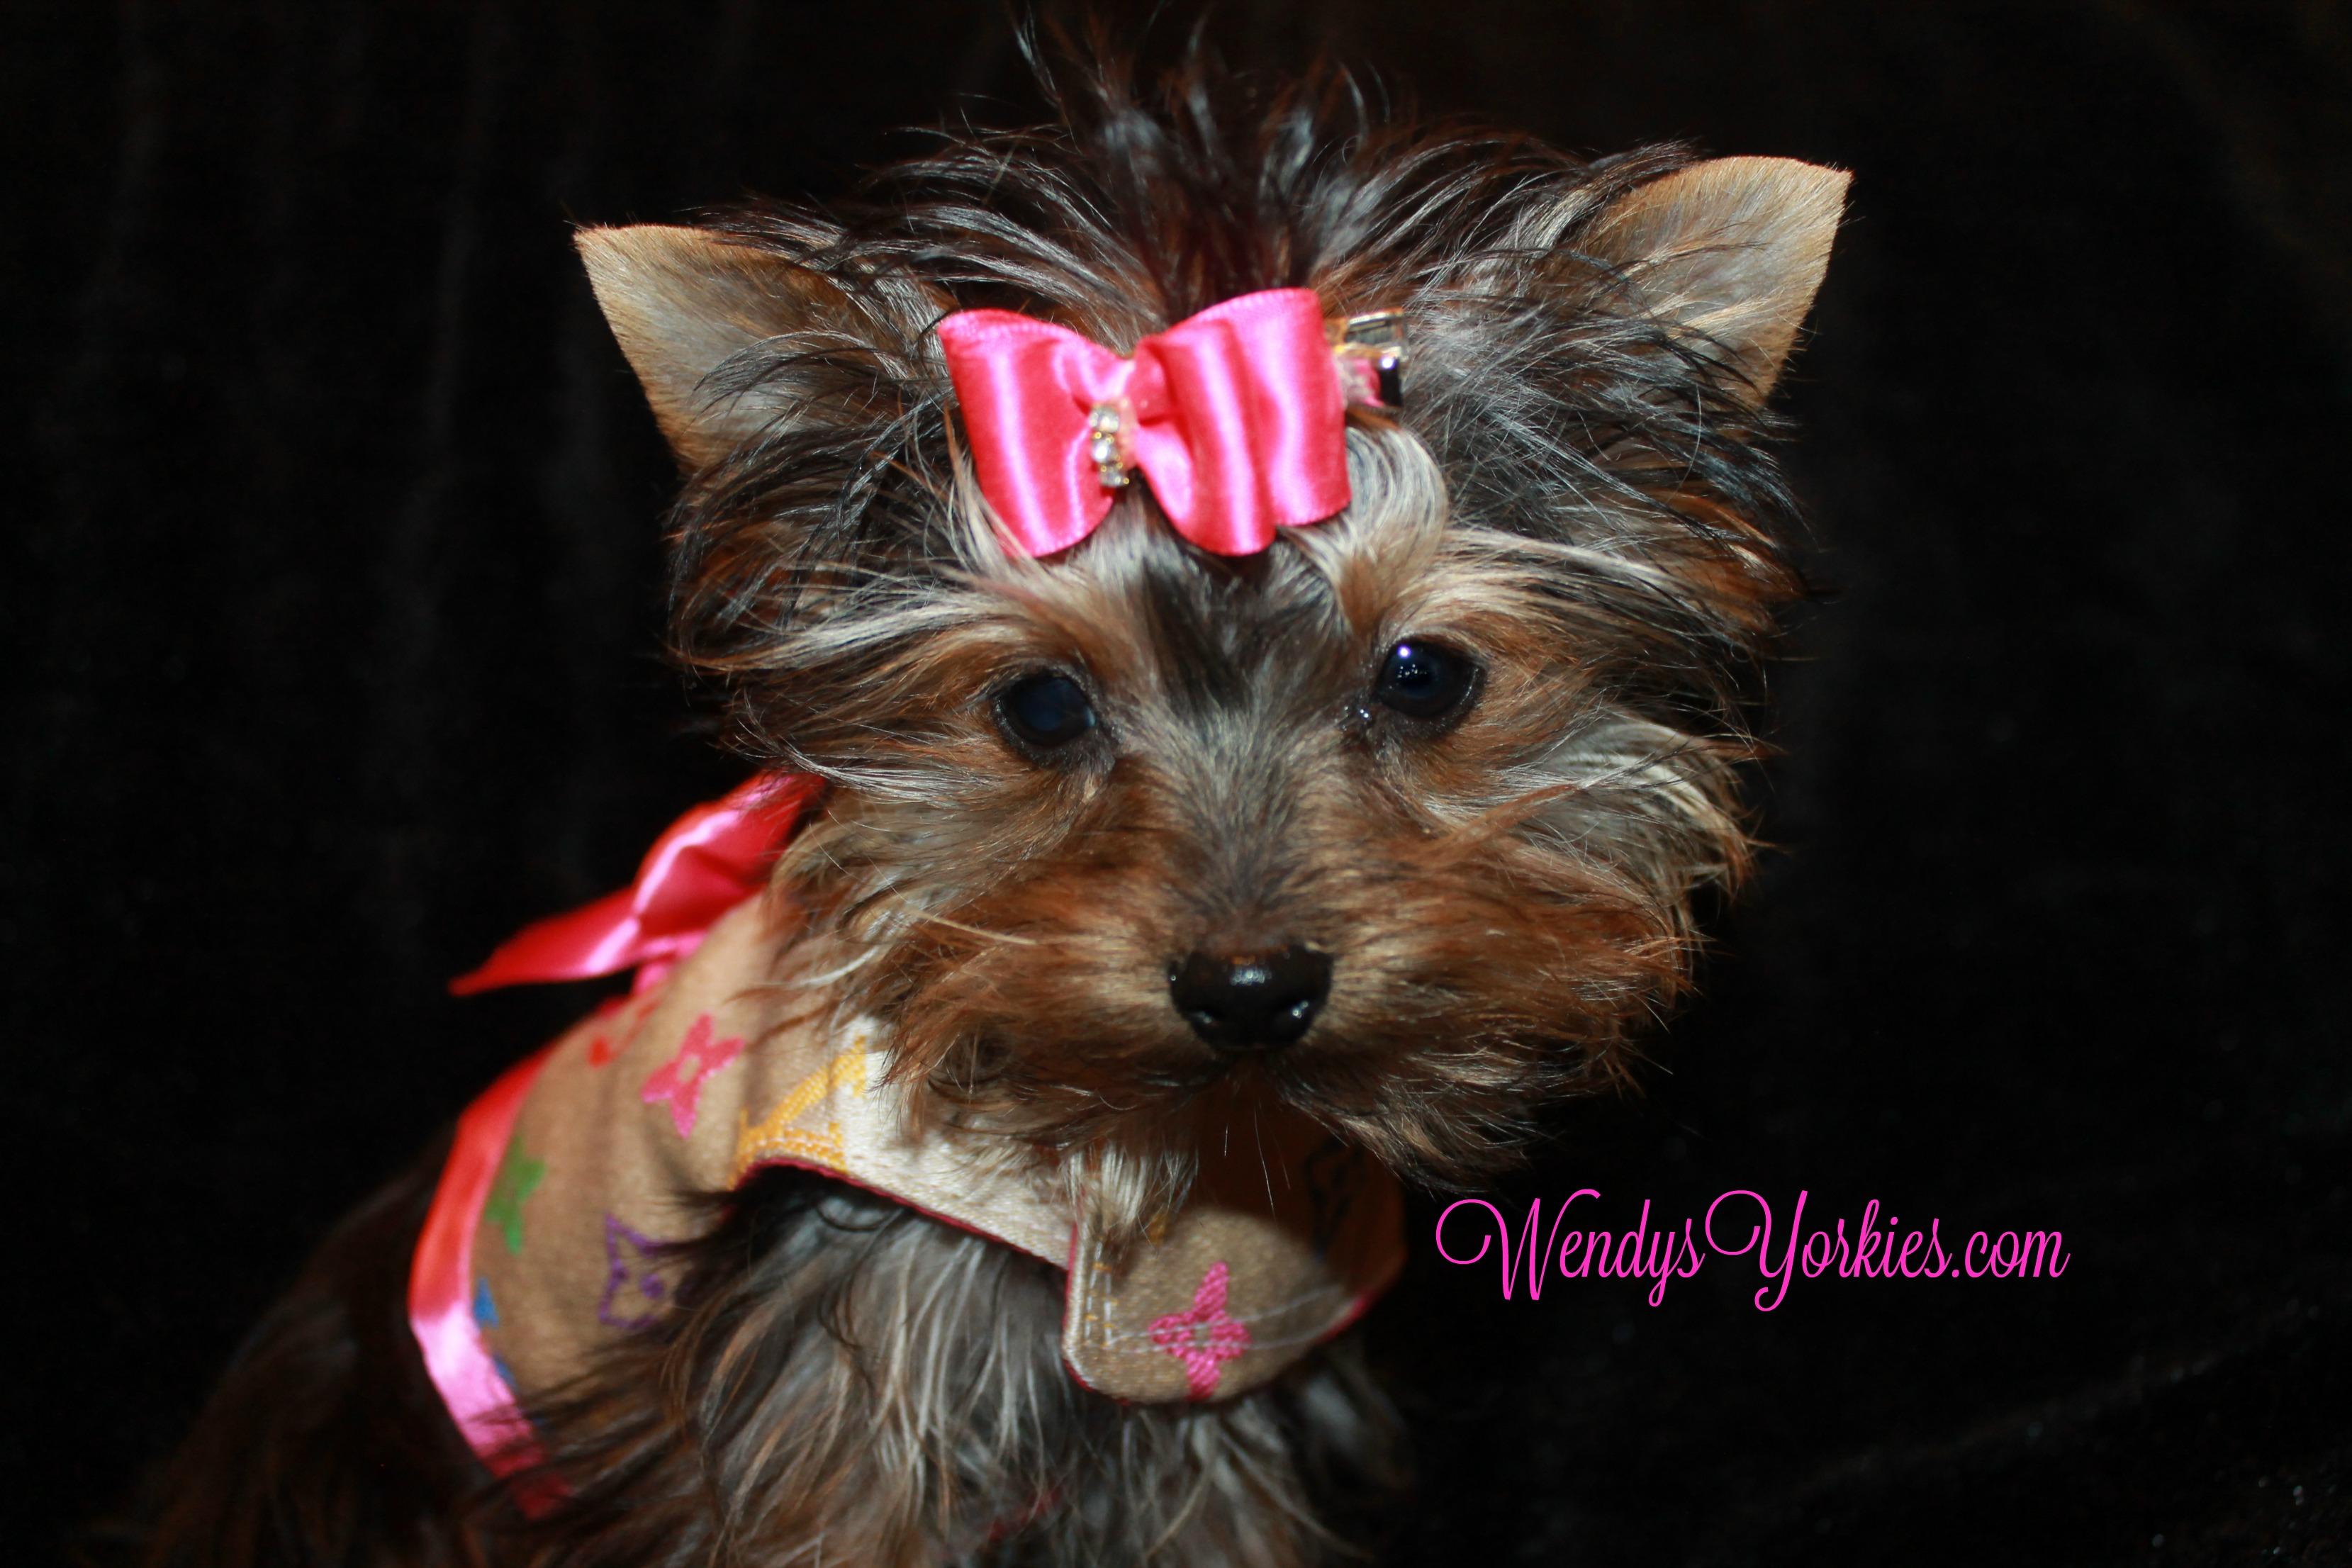 Purse size Yorkies puppy for sale, WEndysYorkies.com, Tiny